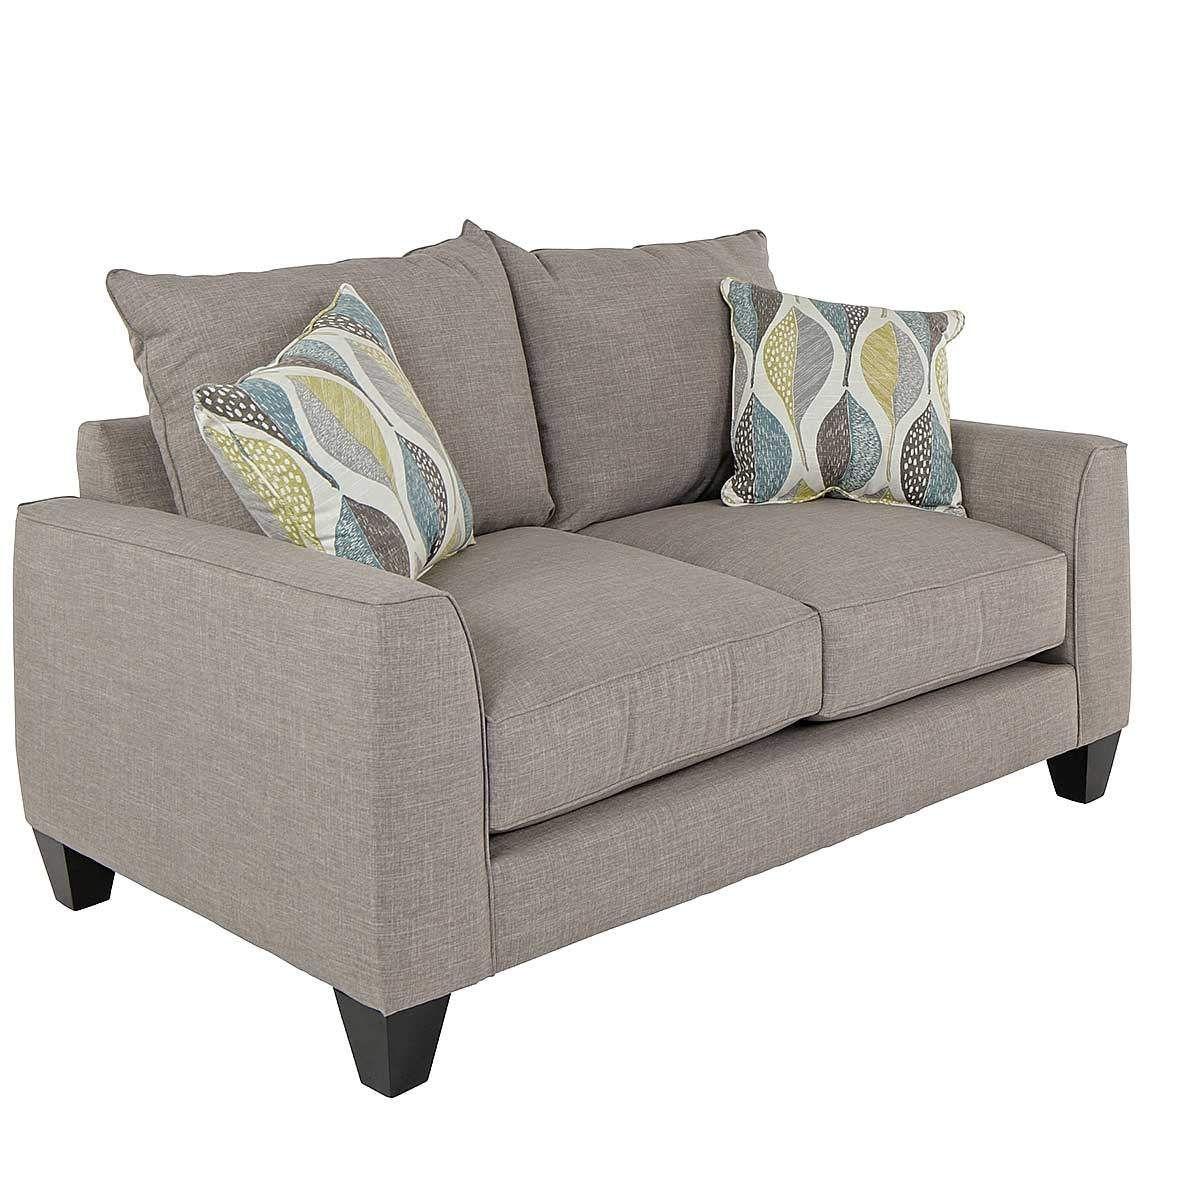 Astounding Celeste Loveseat In Grey Jeromes Furniture 66X40D X37H Ibusinesslaw Wood Chair Design Ideas Ibusinesslaworg